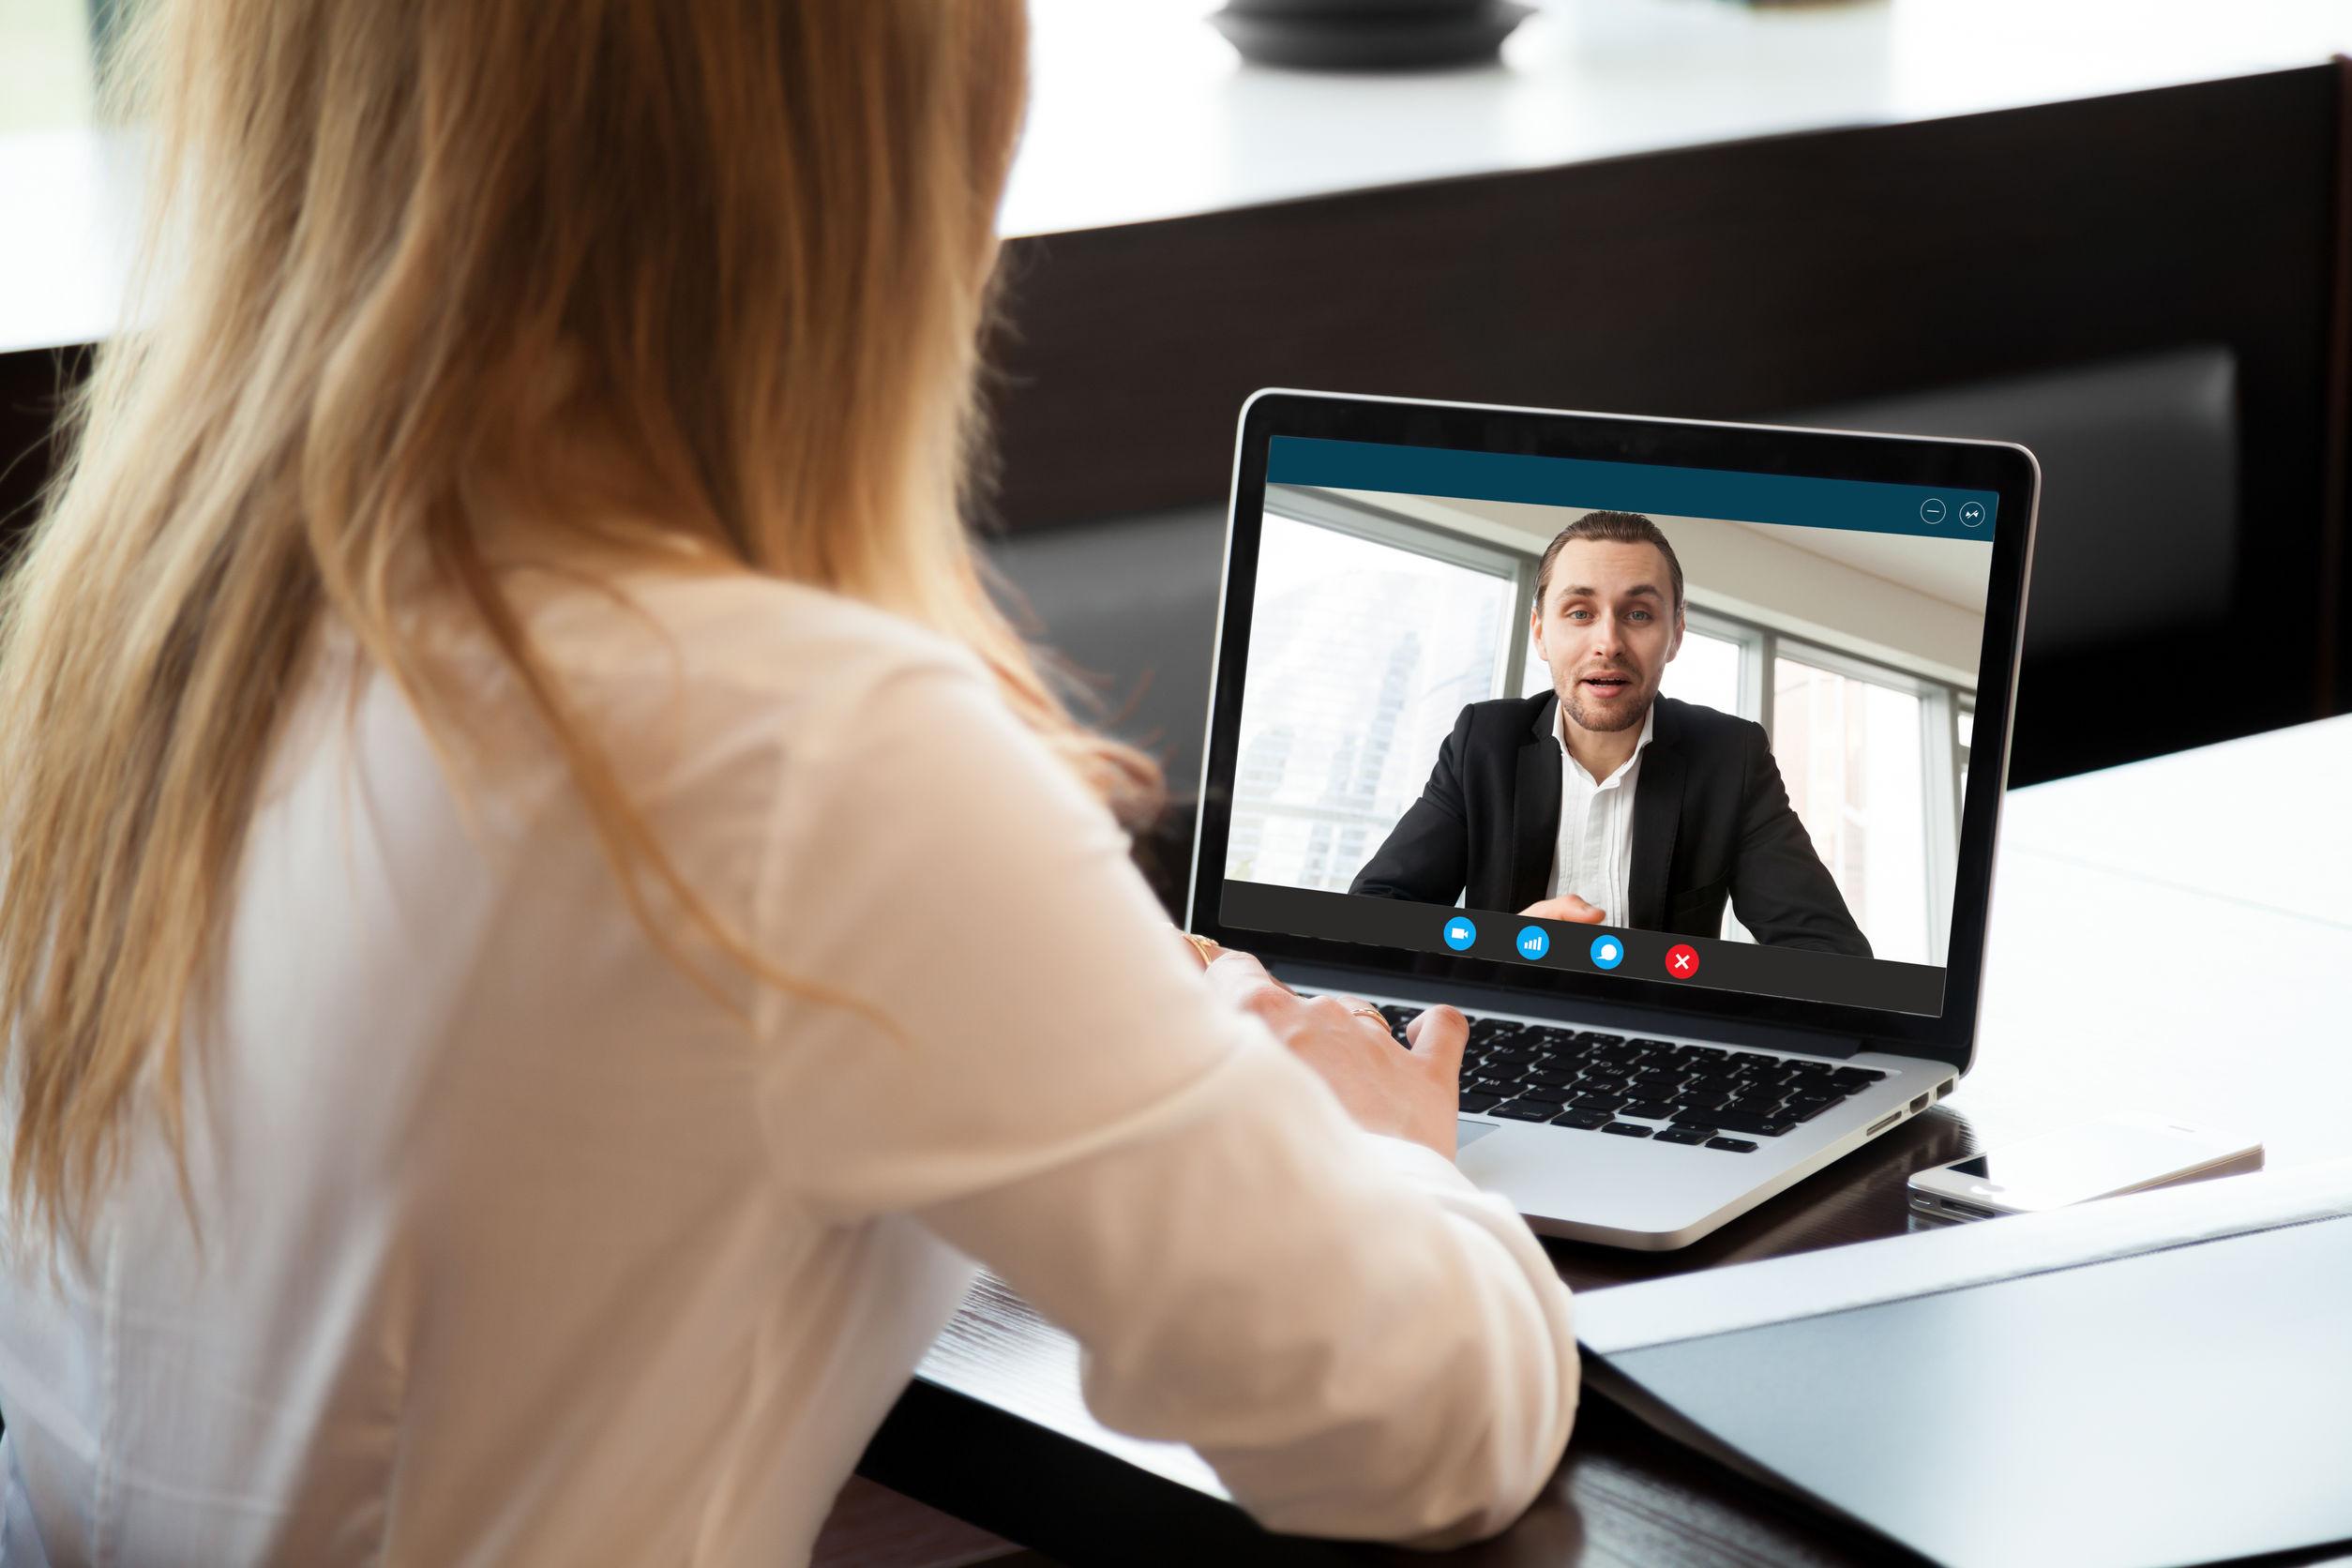 Woman at desk in virtual meeting